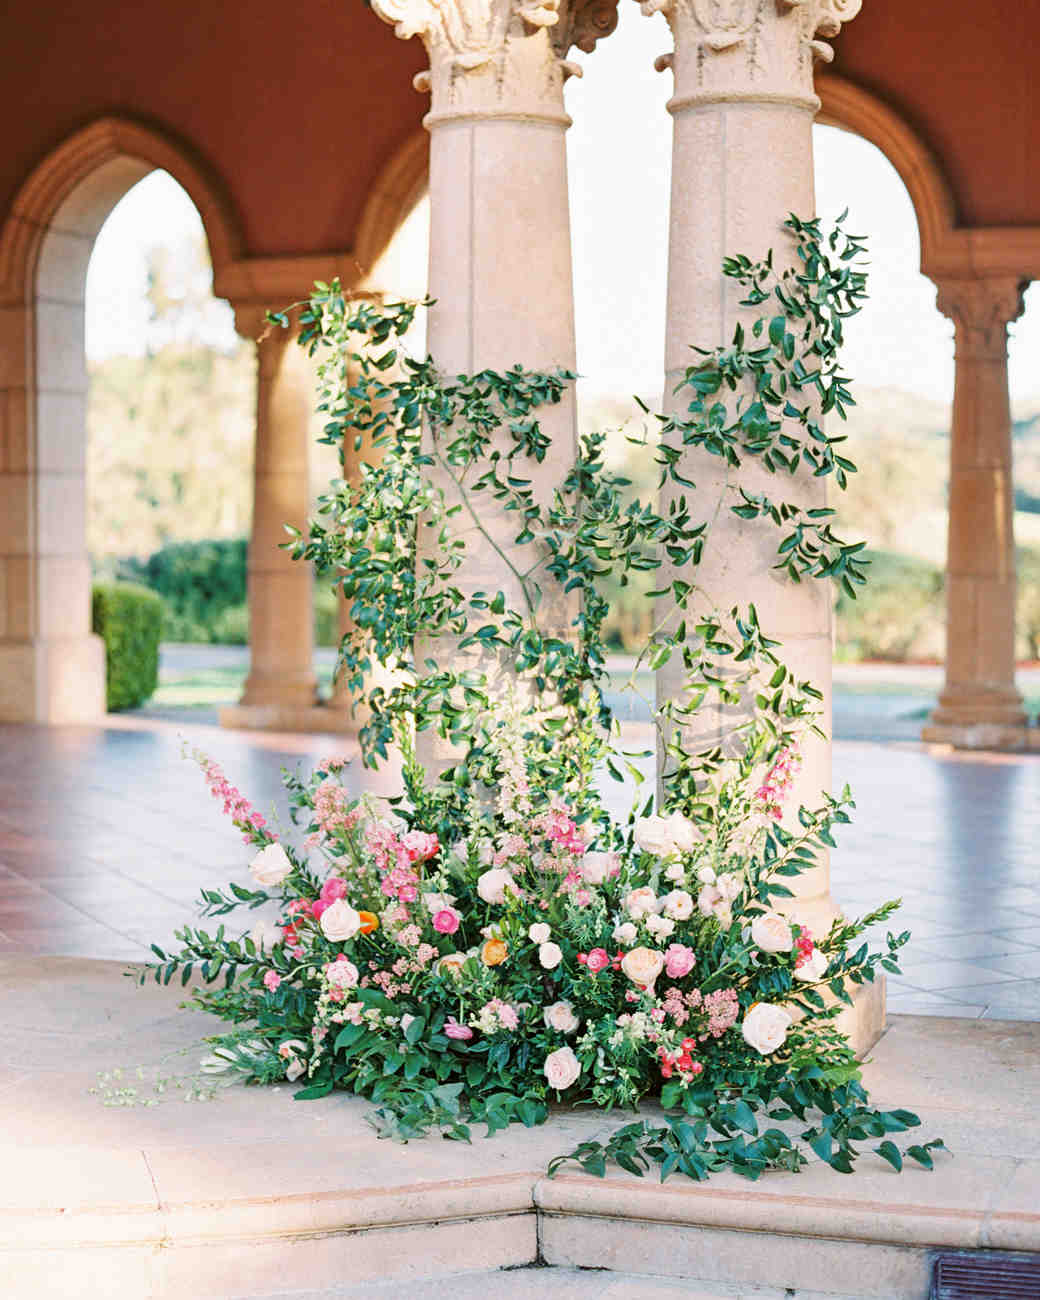 cavin david wedding floral installation in front of columns